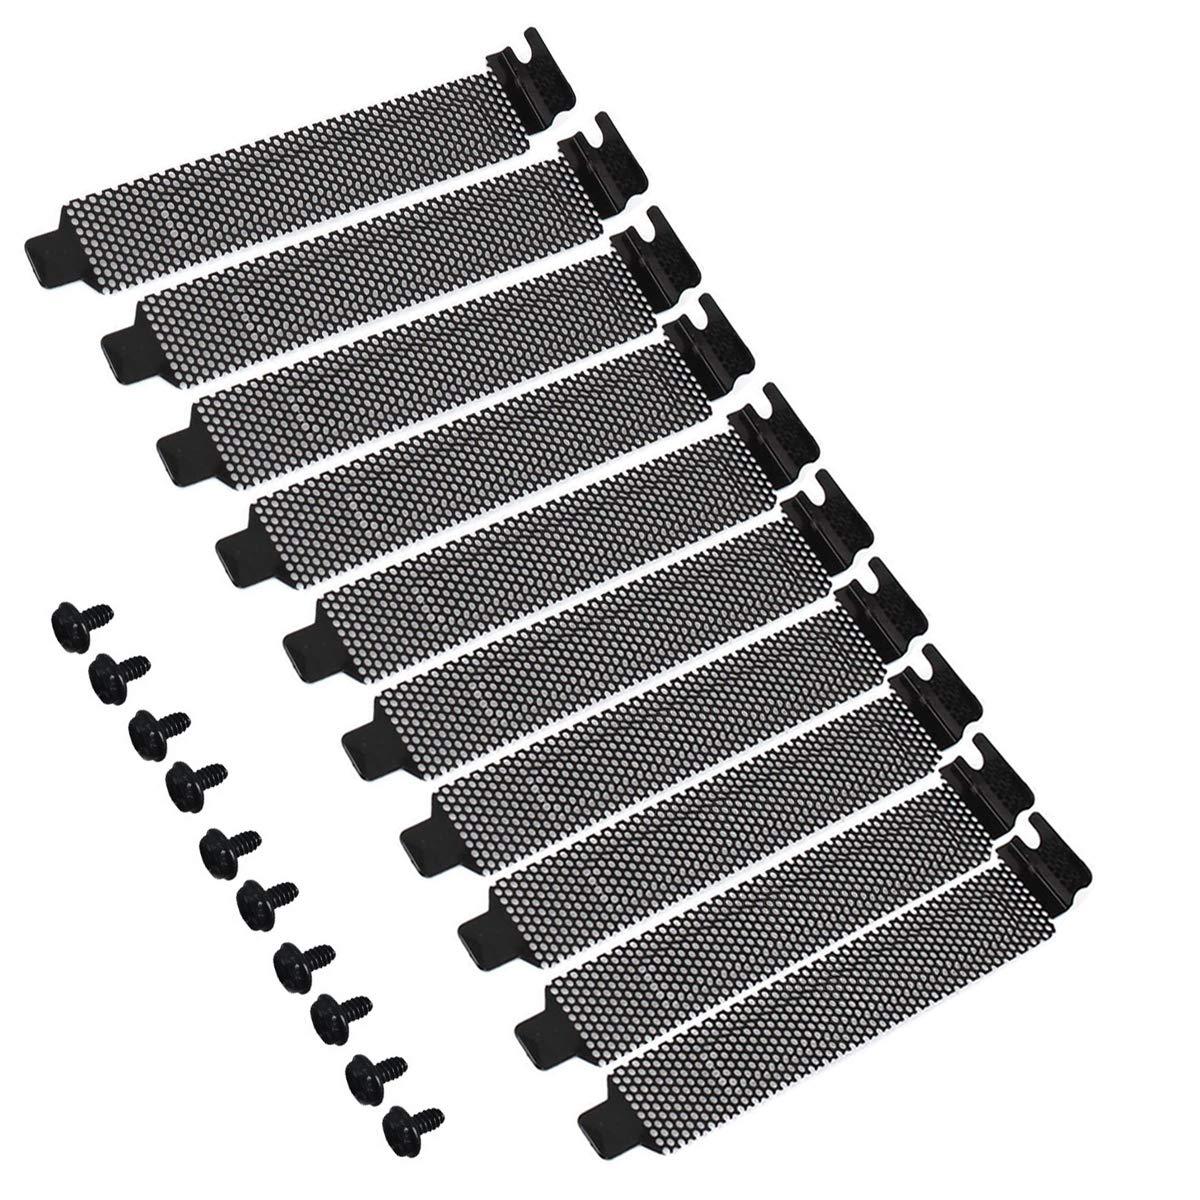 10PCS PCI Slot Cover Dust Filter Black Hard Steel Bracket Expansion Blanking Plate Ventilation Deflector with Screws